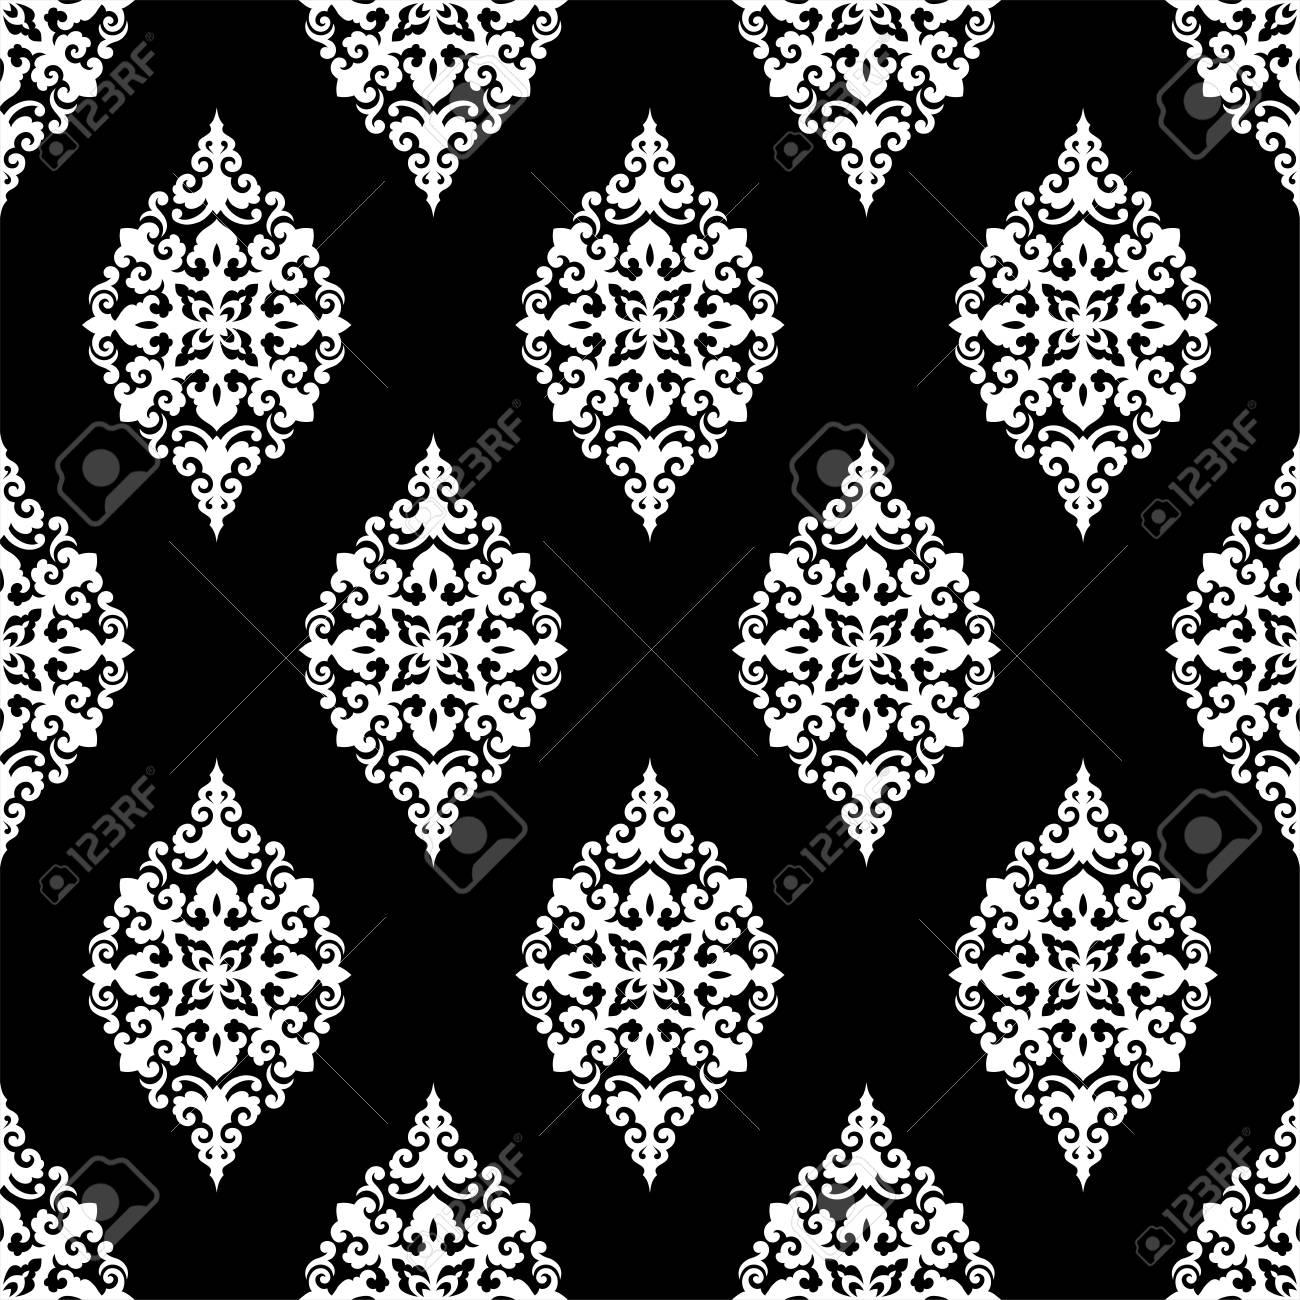 Seamless vector pattern. Traditional asian ornamental motive. - 125667863